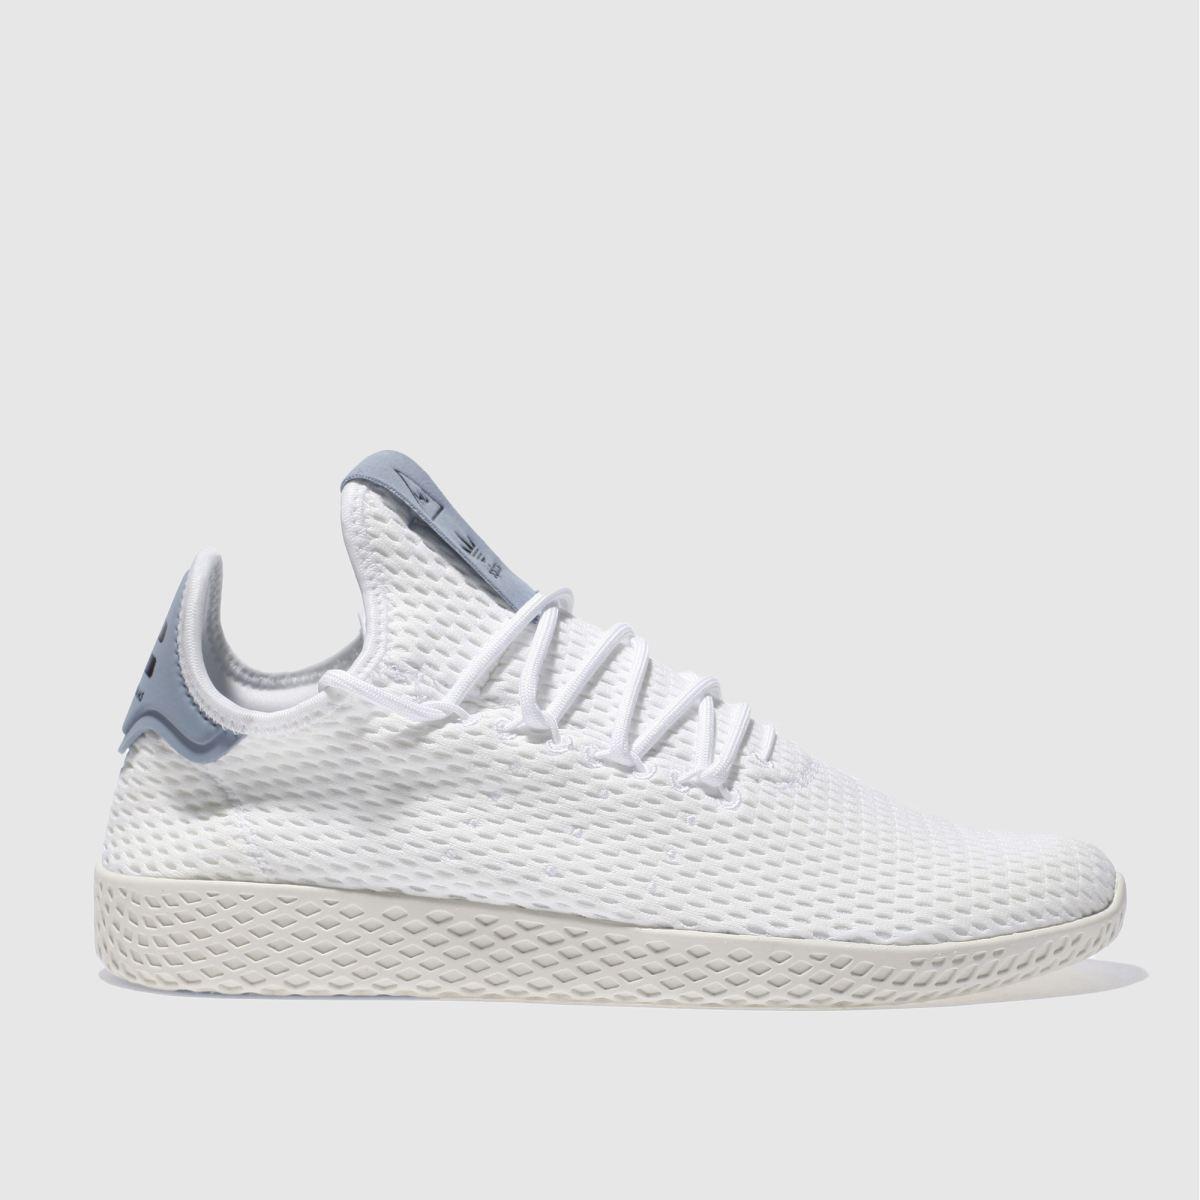 adidas white & blue pharrell whilliams tennis hu trainers